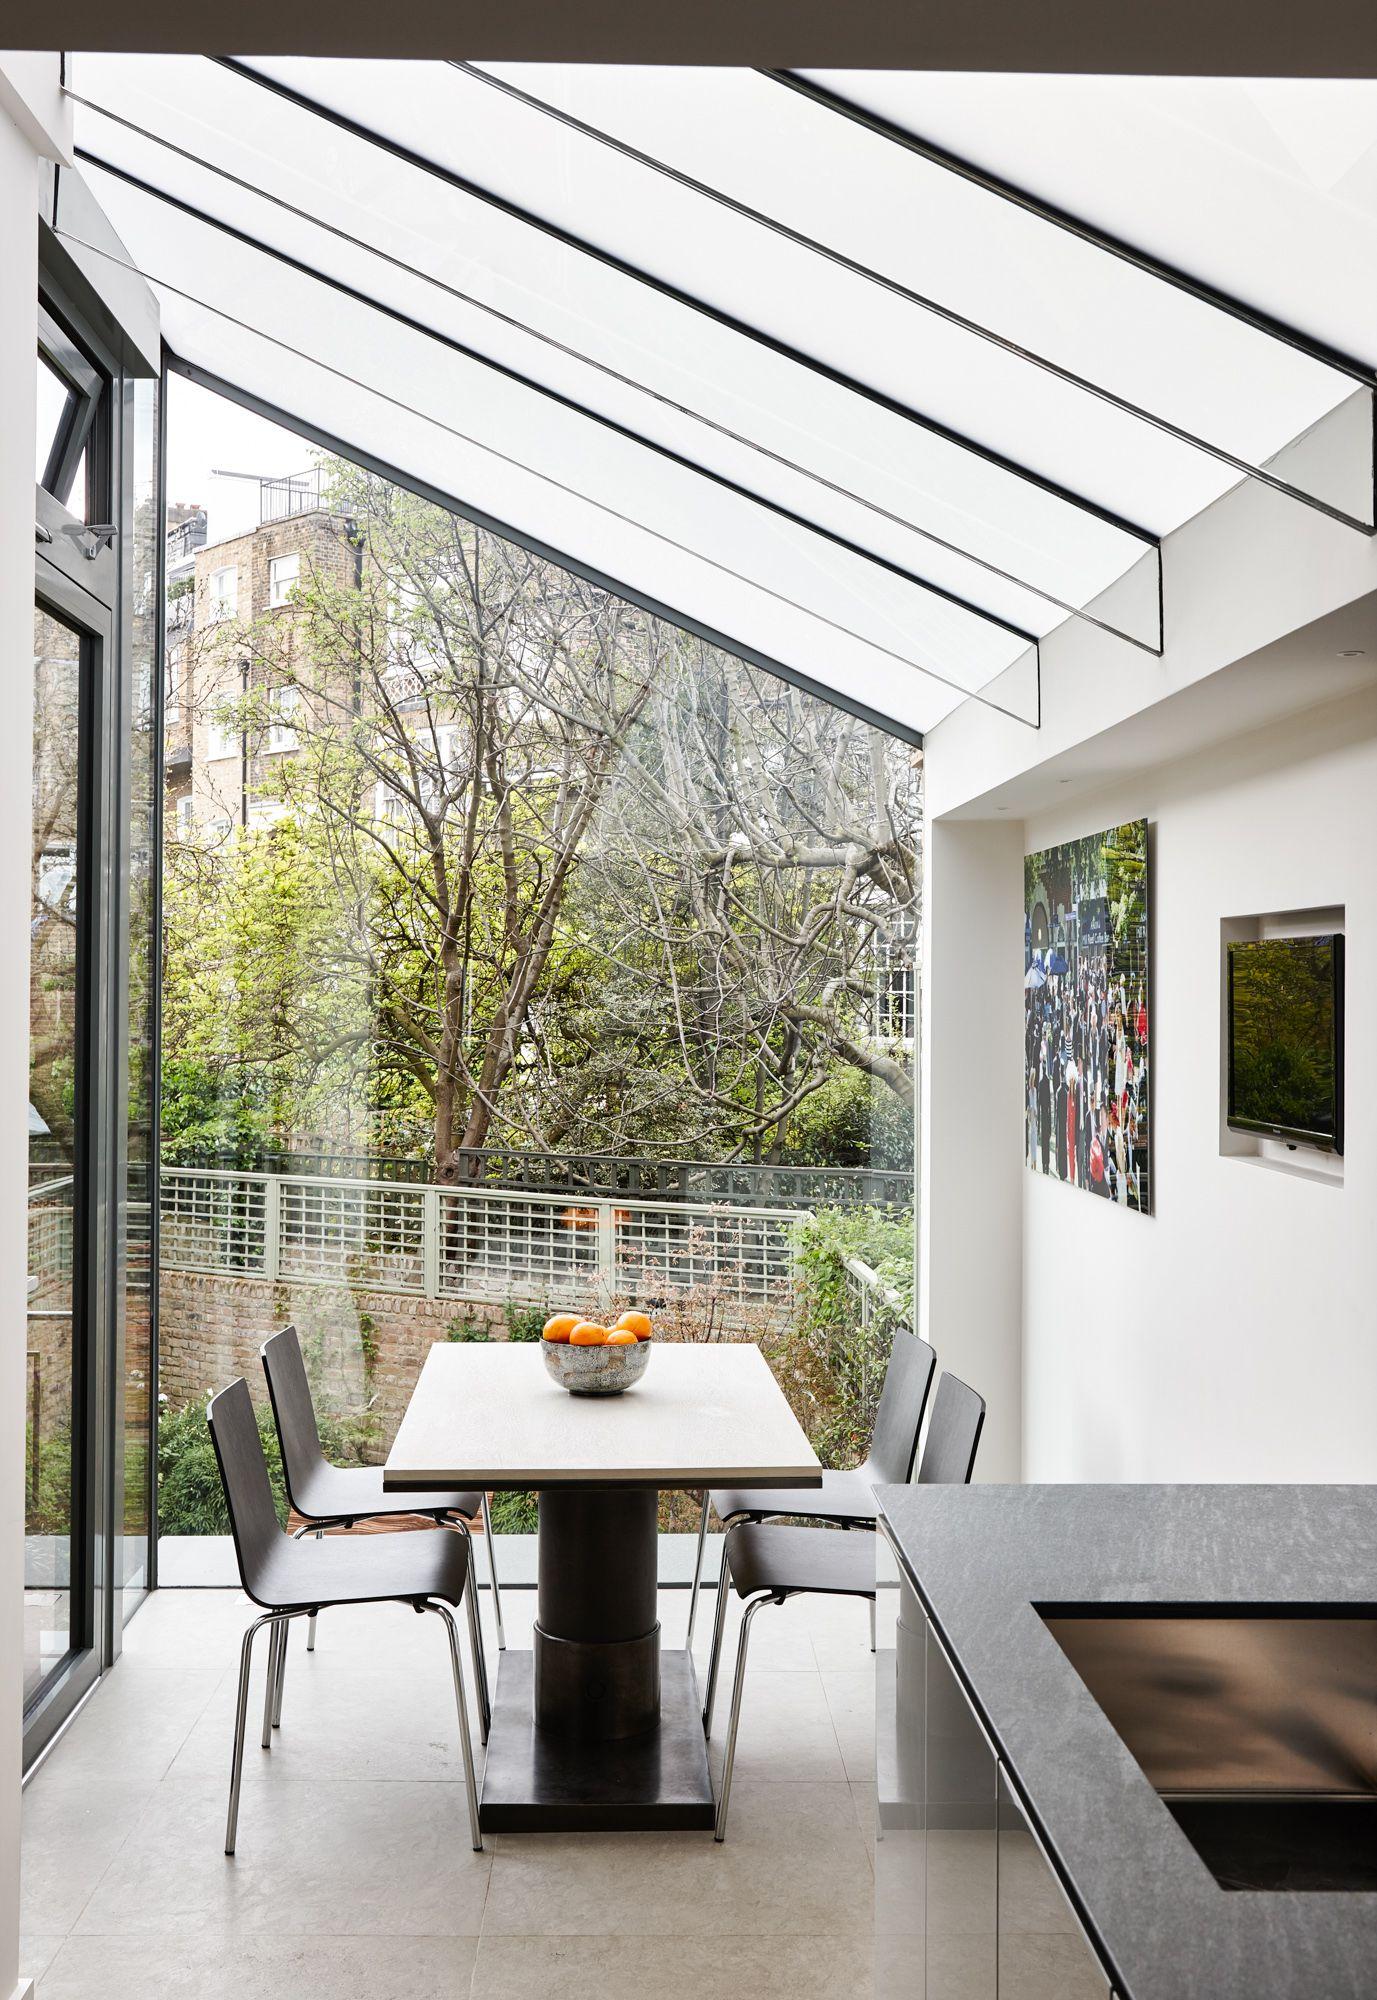 Trombe Internal Photo Of Structurally Glazed Modern